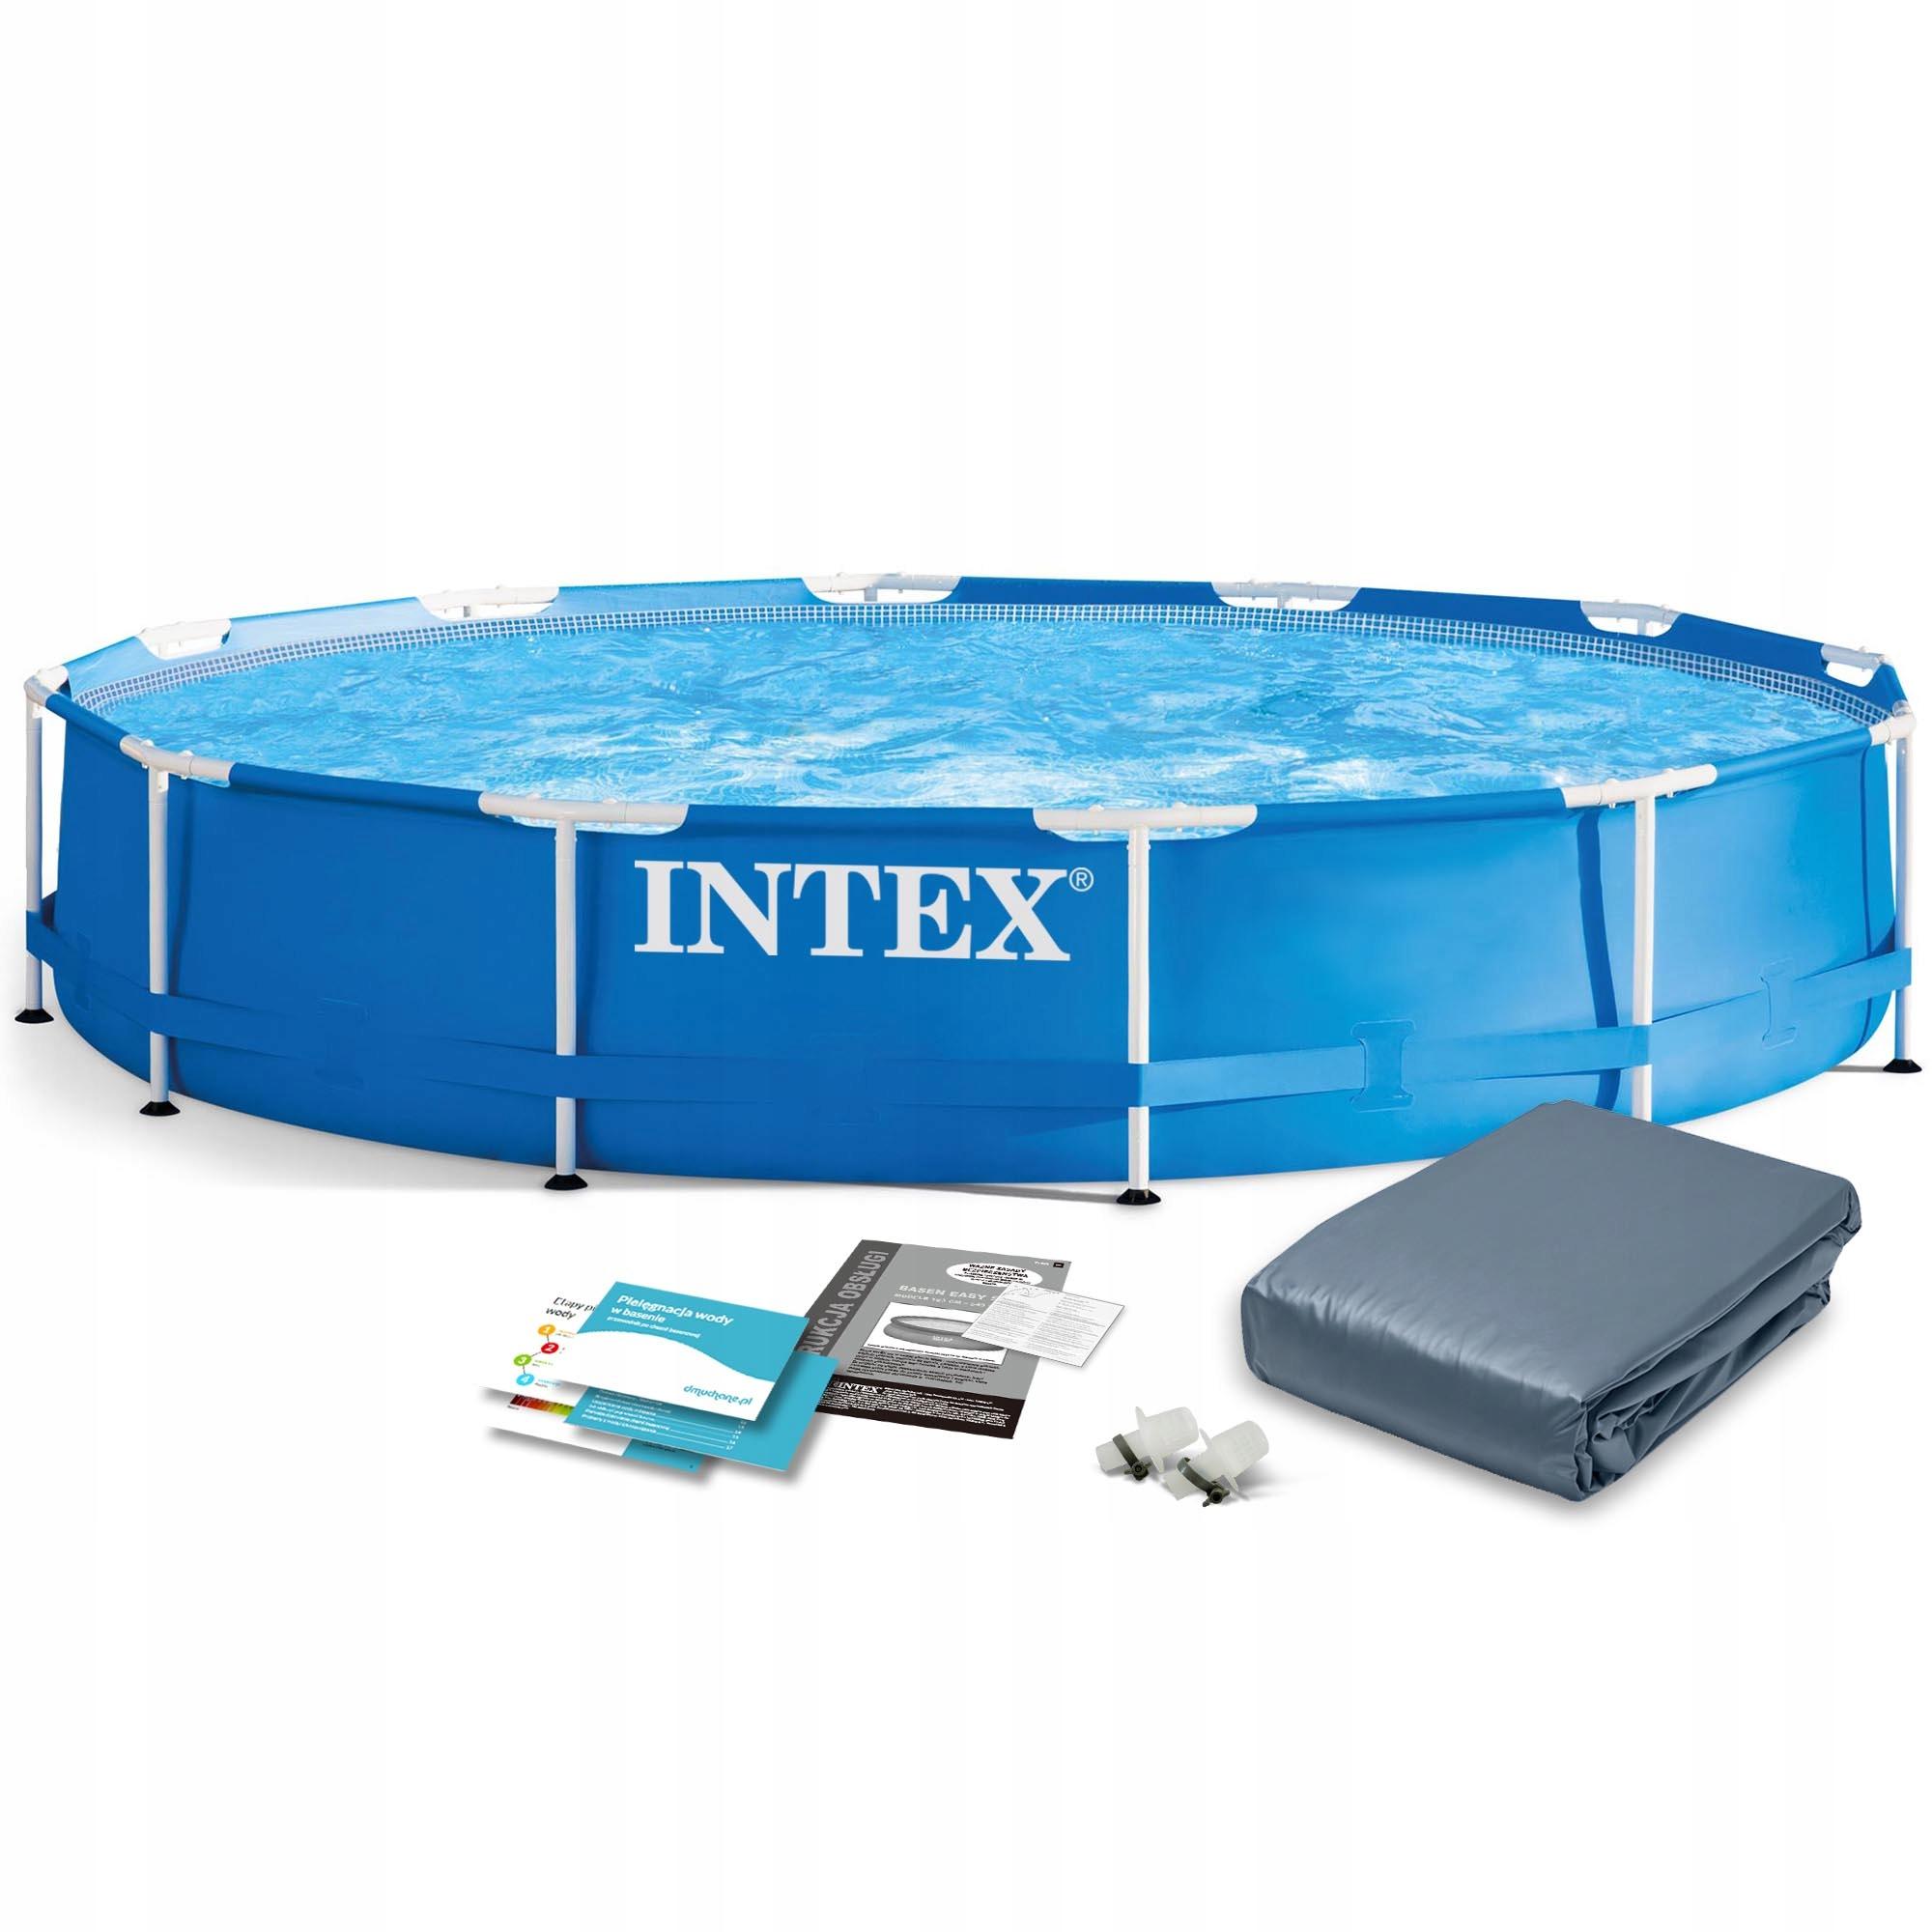 Basen Ogrodowy Stelazowy Intex 366x76 6w1 Pokrywa 8311806777 Allegro Pl